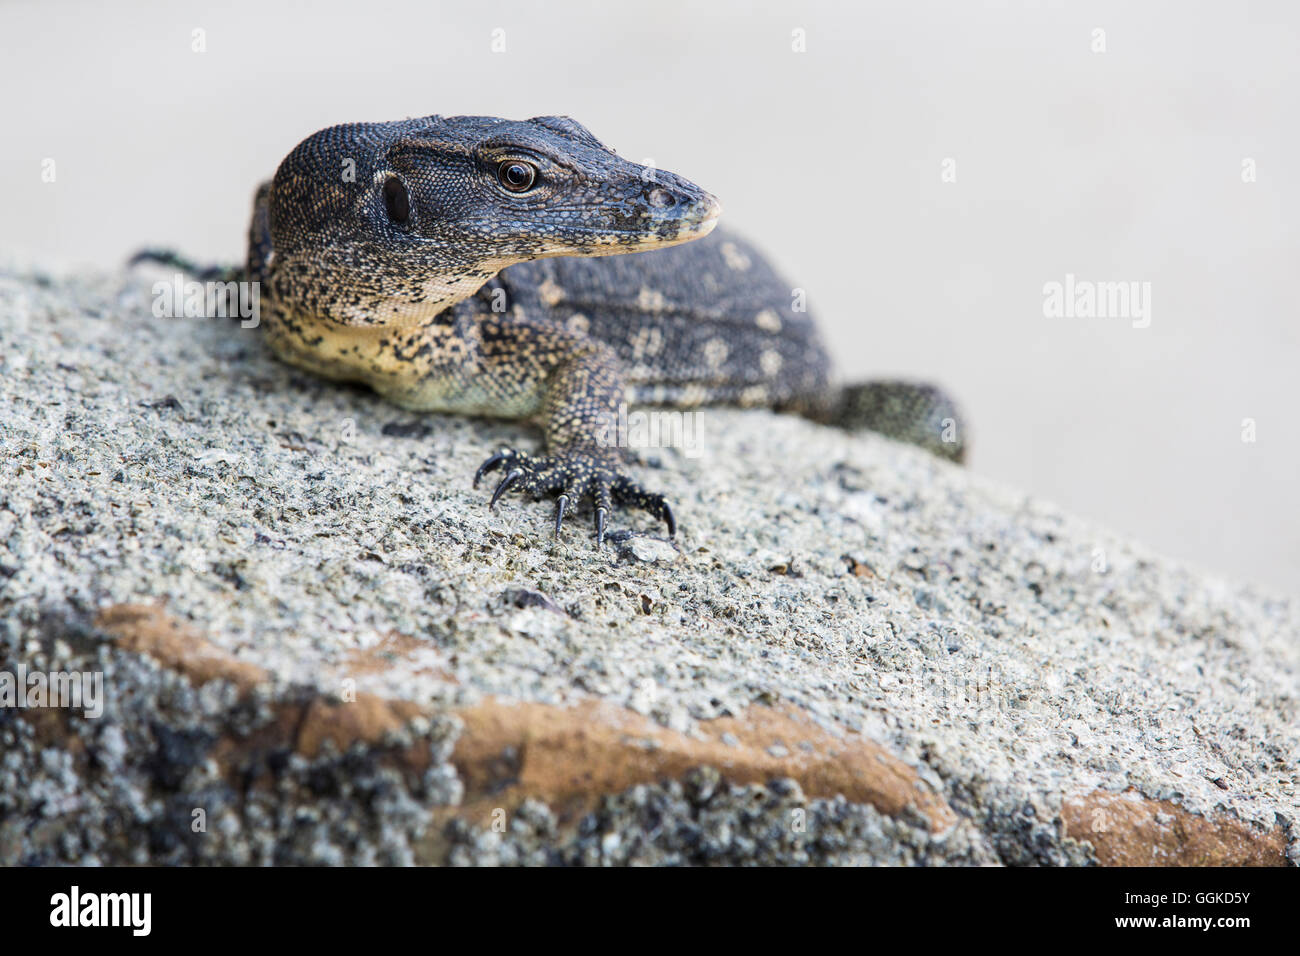 A lizard on the beach, Kota Kinabalu, Borneo, Malaysia. - Stock Image